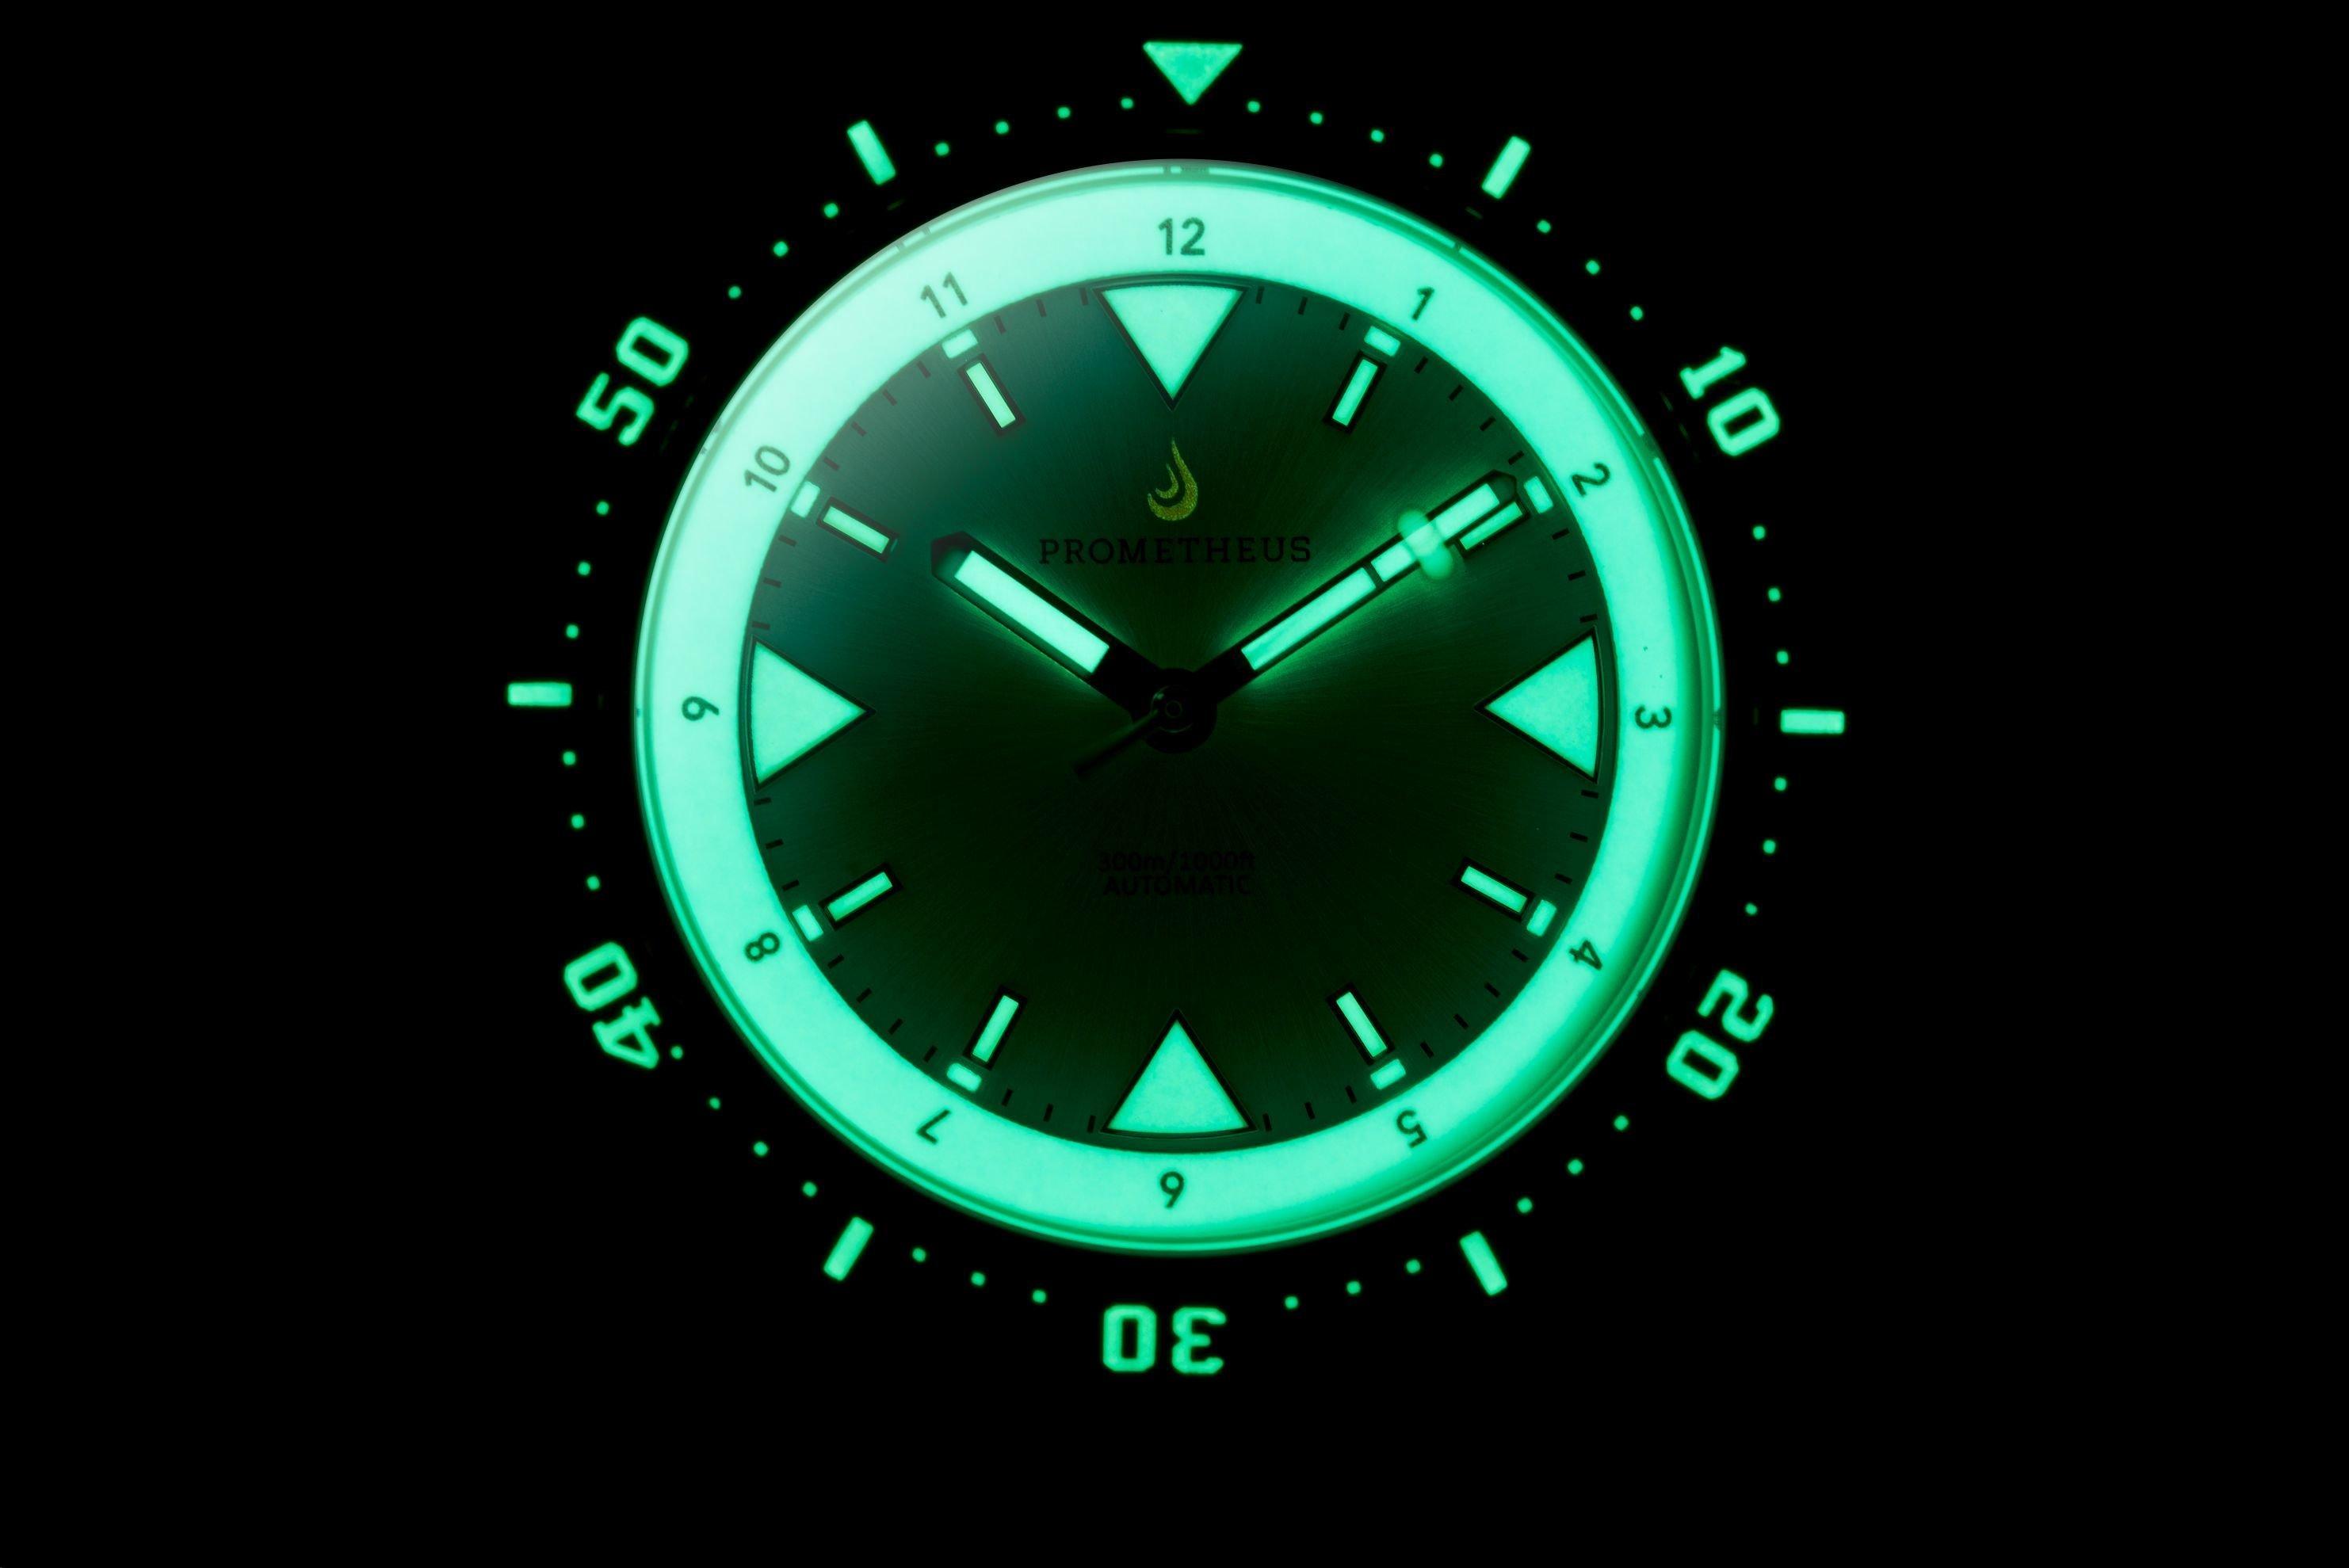 Pre-Order Prometheus Eagle Ray Version 5A1 Black Dial No Date C3X1 Superluminova